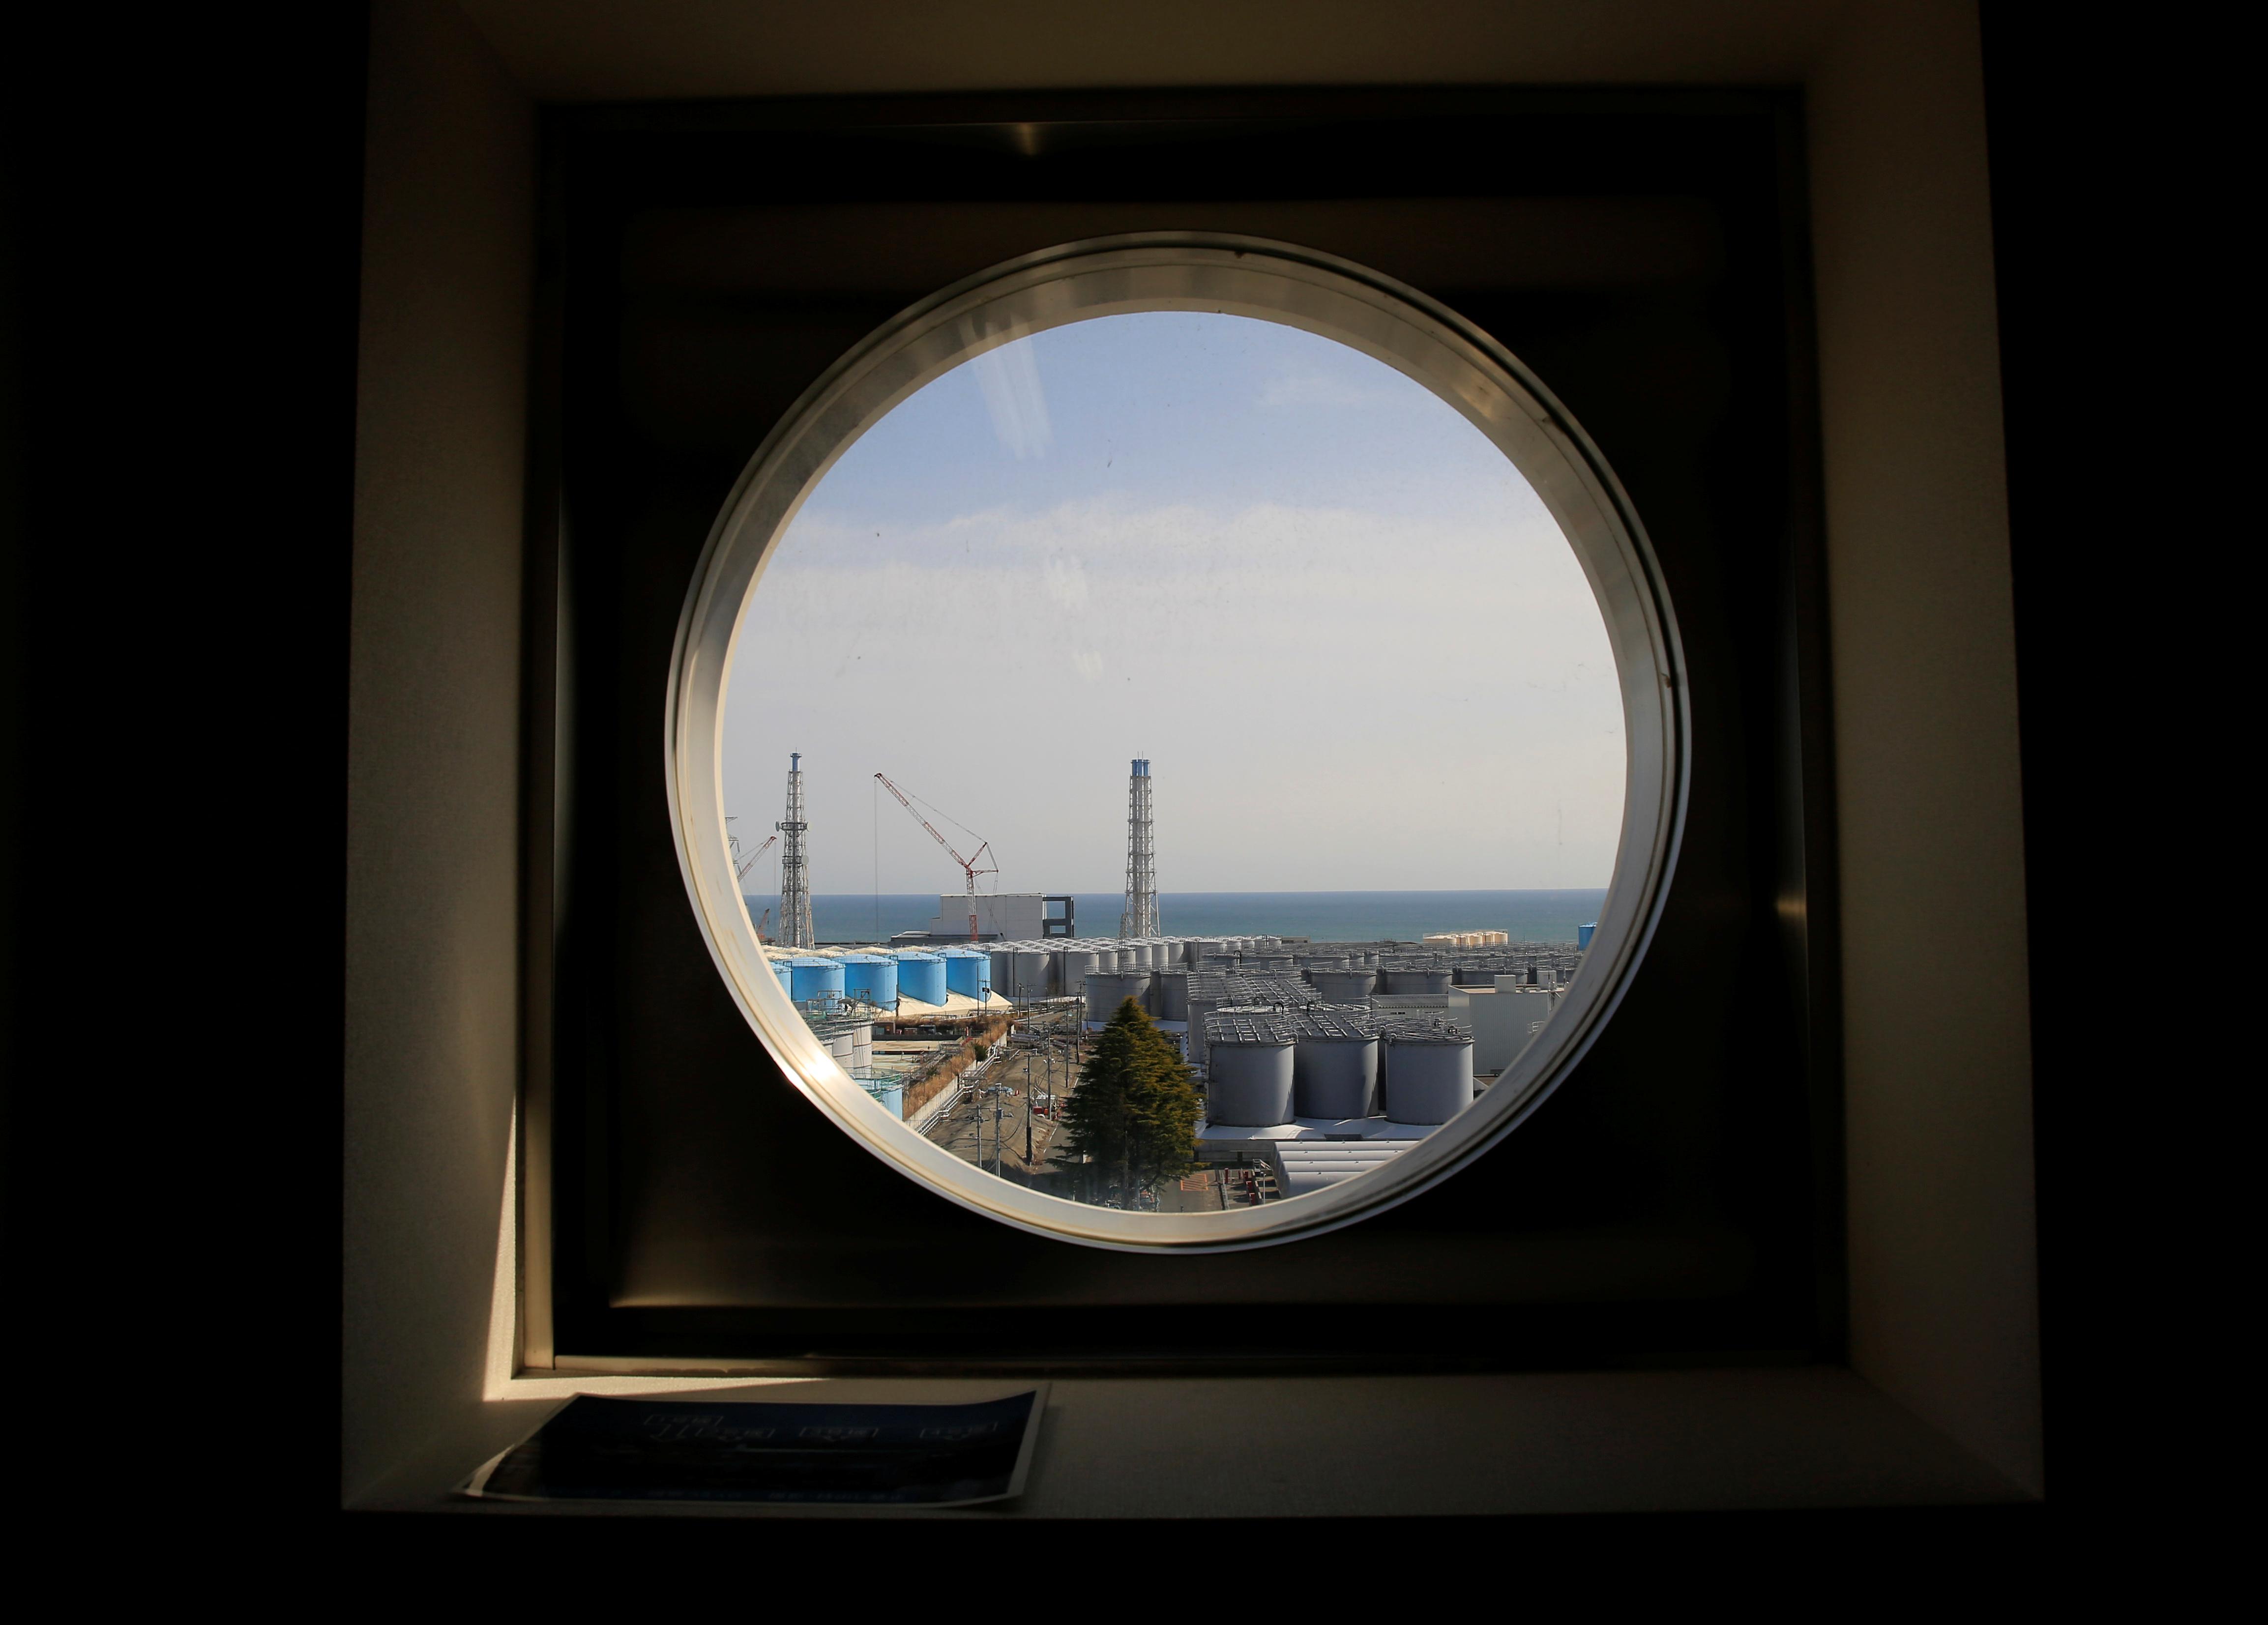 The storage tanks for treated water are seen through a window at the tsunami-crippled Fukushima Daiichi nuclear power plant in Okuma town, Fukushima prefecture, Japan March 1, 2021. REUTERS/Sakura Murakami